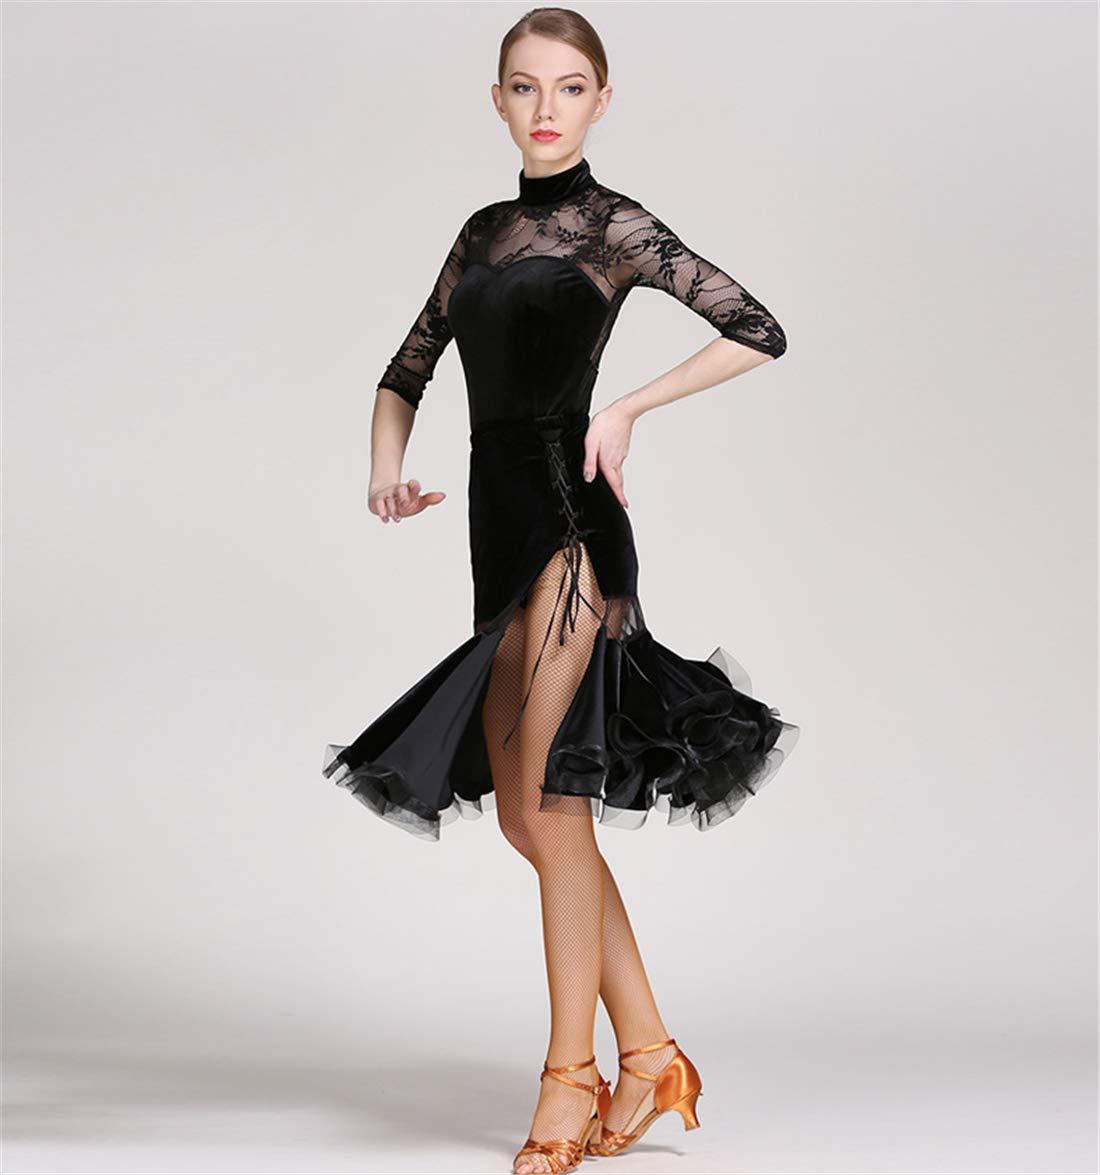 1d1656d6a Woman Latin Dance Dress Dancing Unifom Lace Long Sleeve Split Skirt  National Dance Dress Waltz Ballroom Dance Tango Practice Competition  Costumes: ...